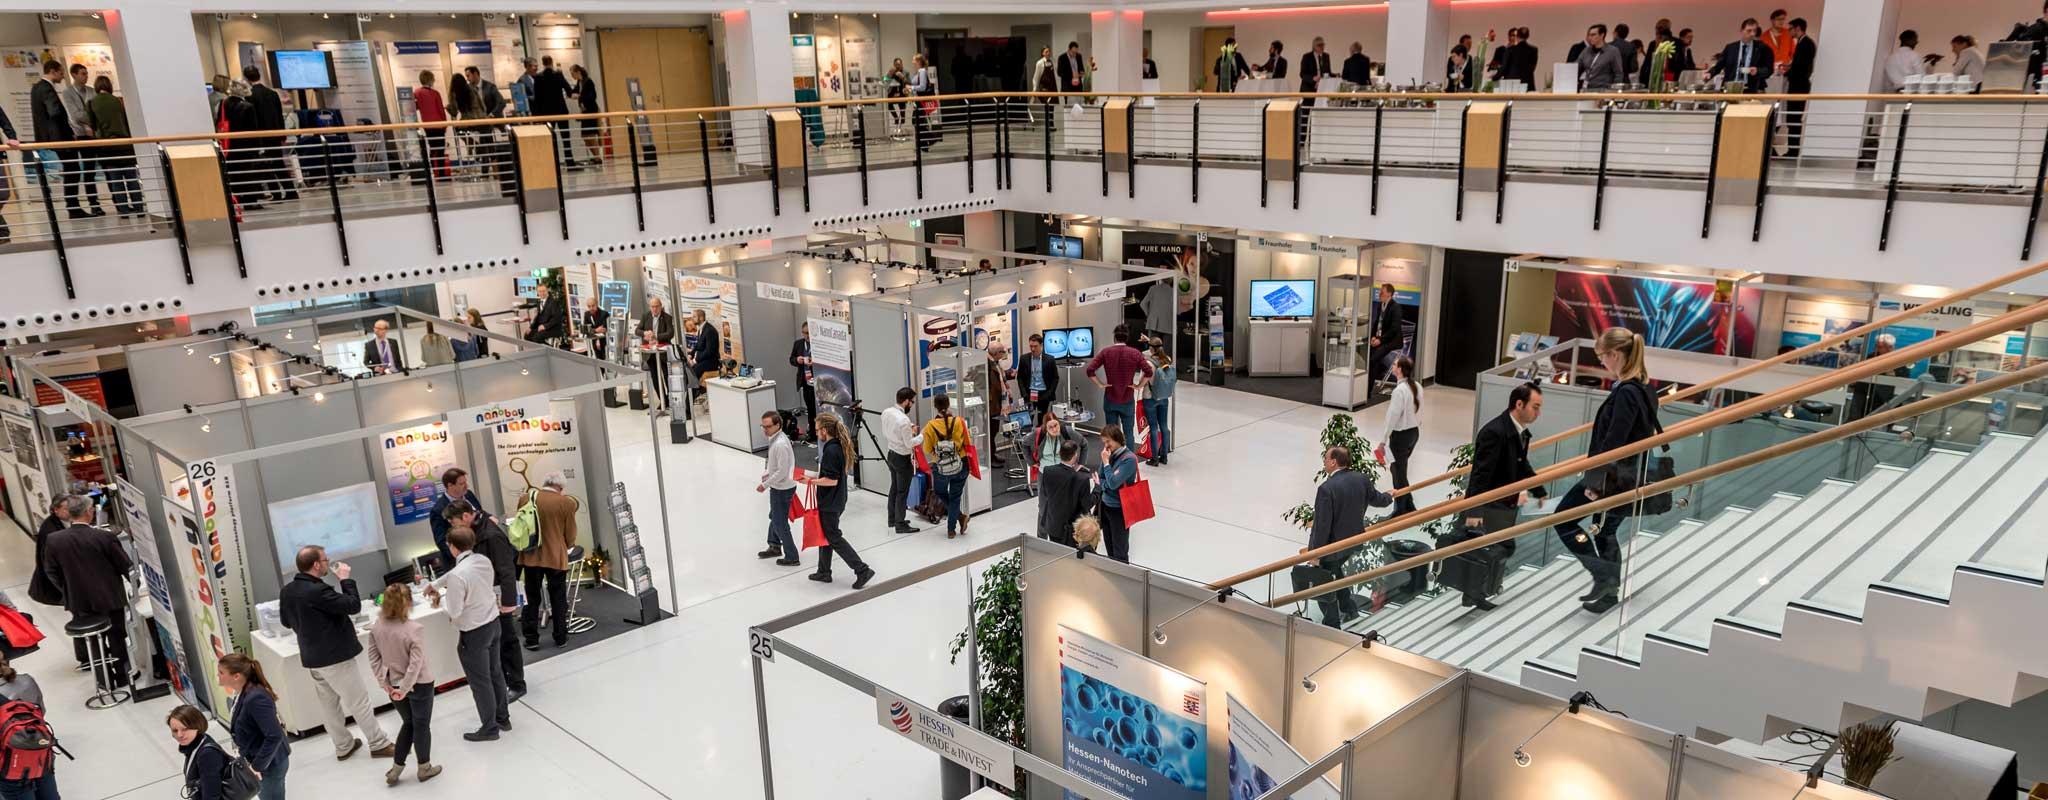 Exhibition of the 7th NRW Nano Conference